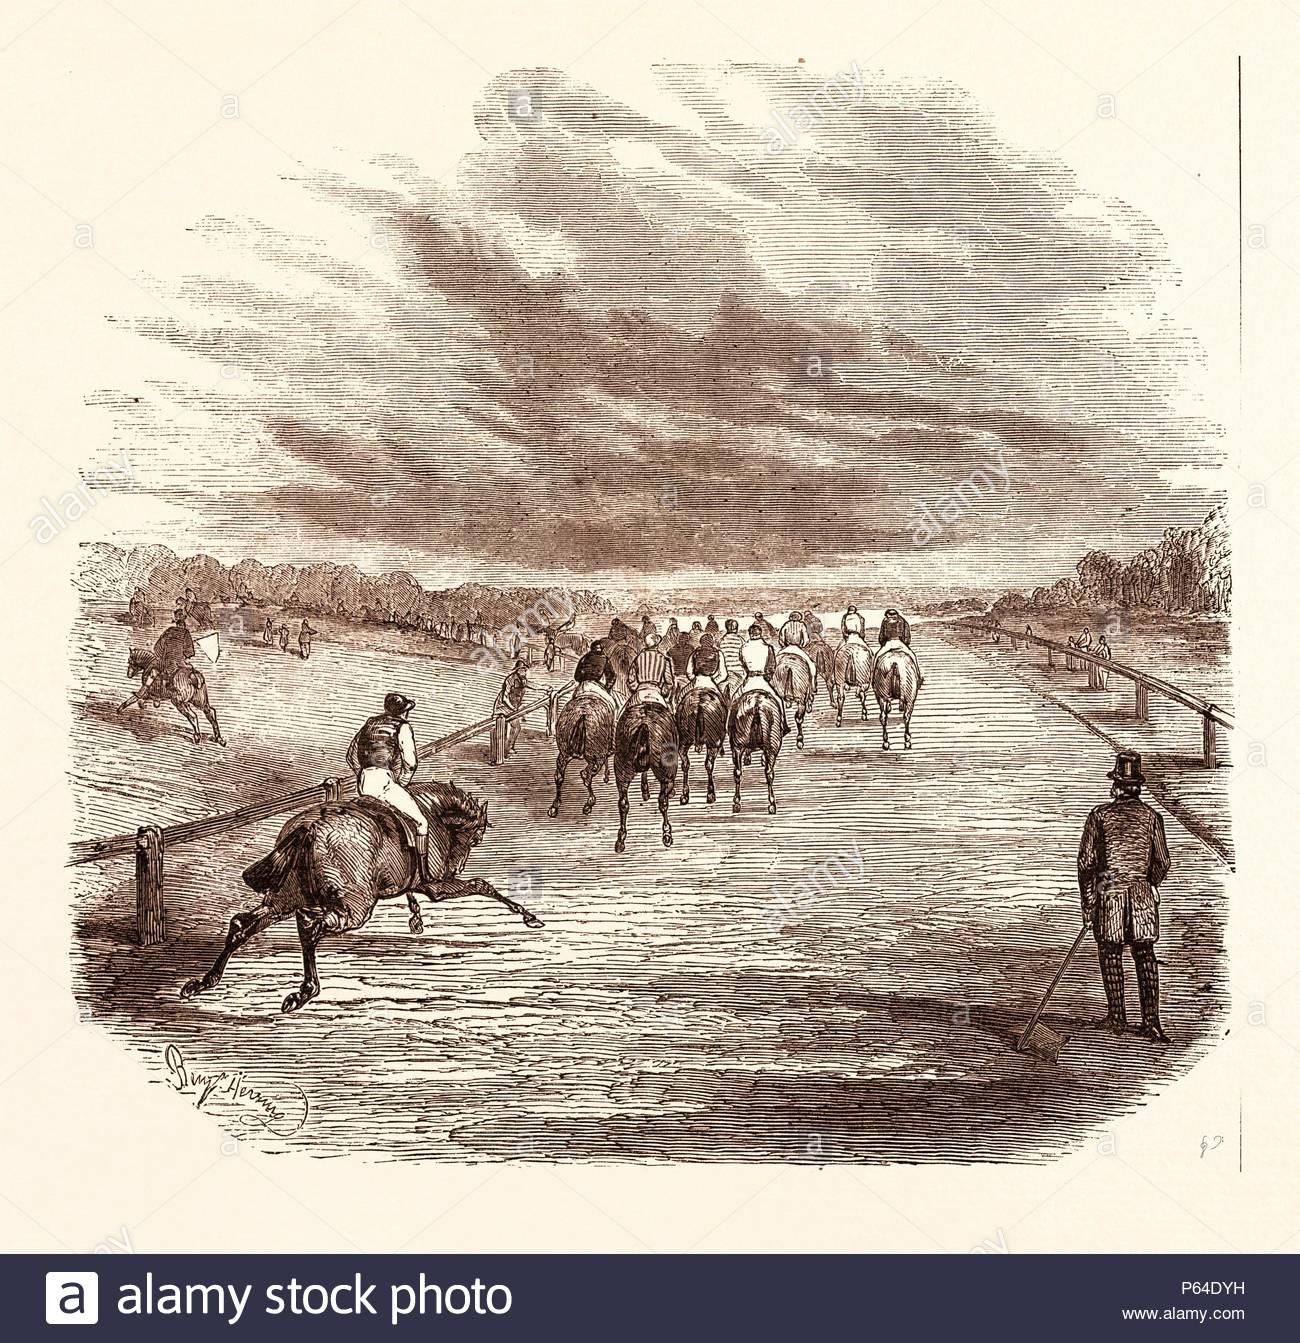 Racing Horse Jockey Race Thoroughbred Derby Equestrian Racehorse Hippodrome Run Gallop Riding Track